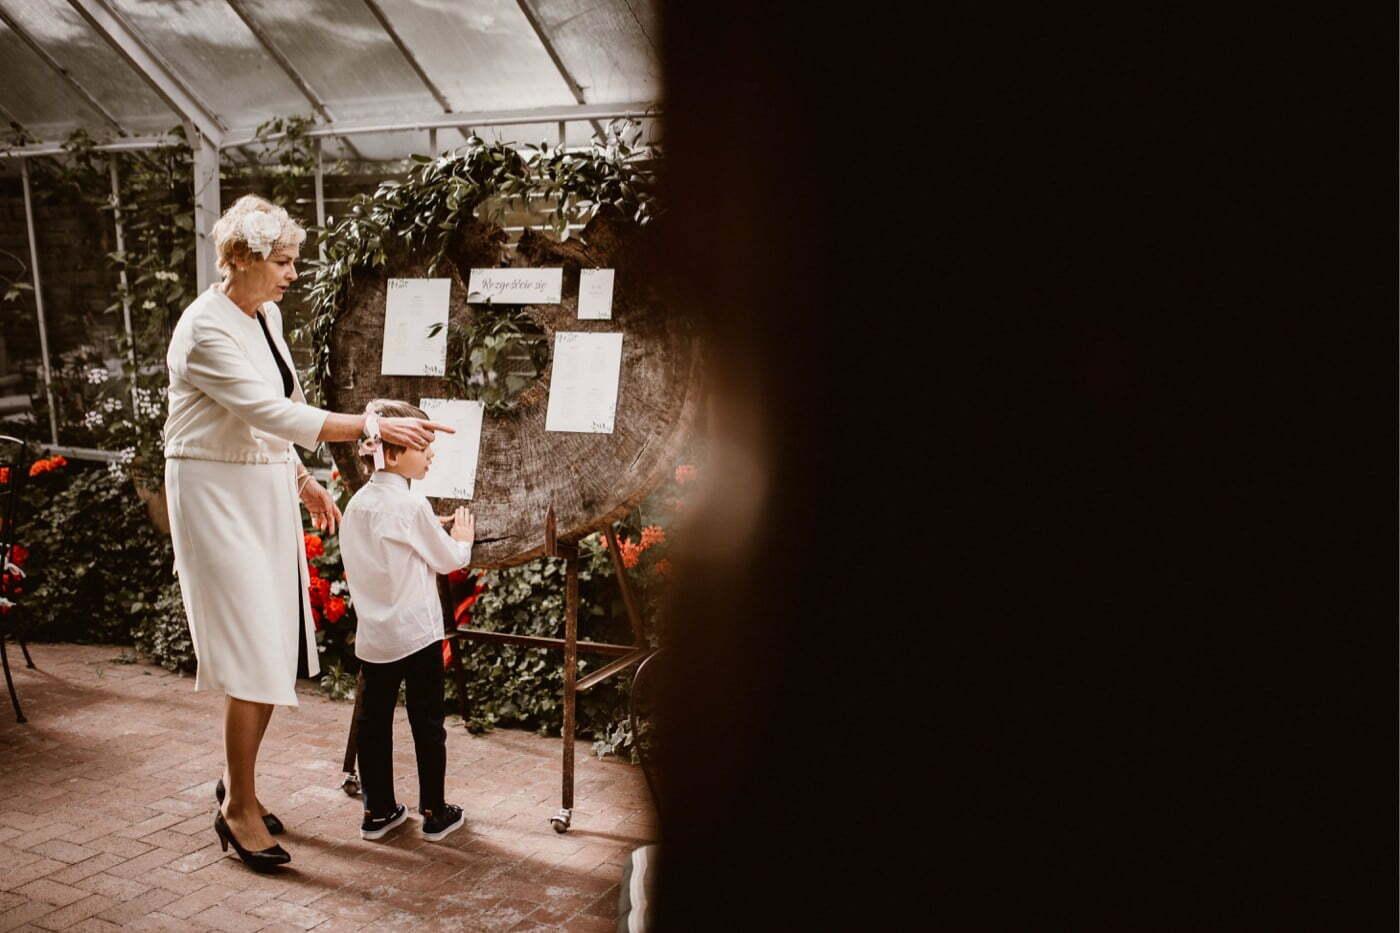 ewelina zieba rustykalne wesele stara oranzeria warszawa 061